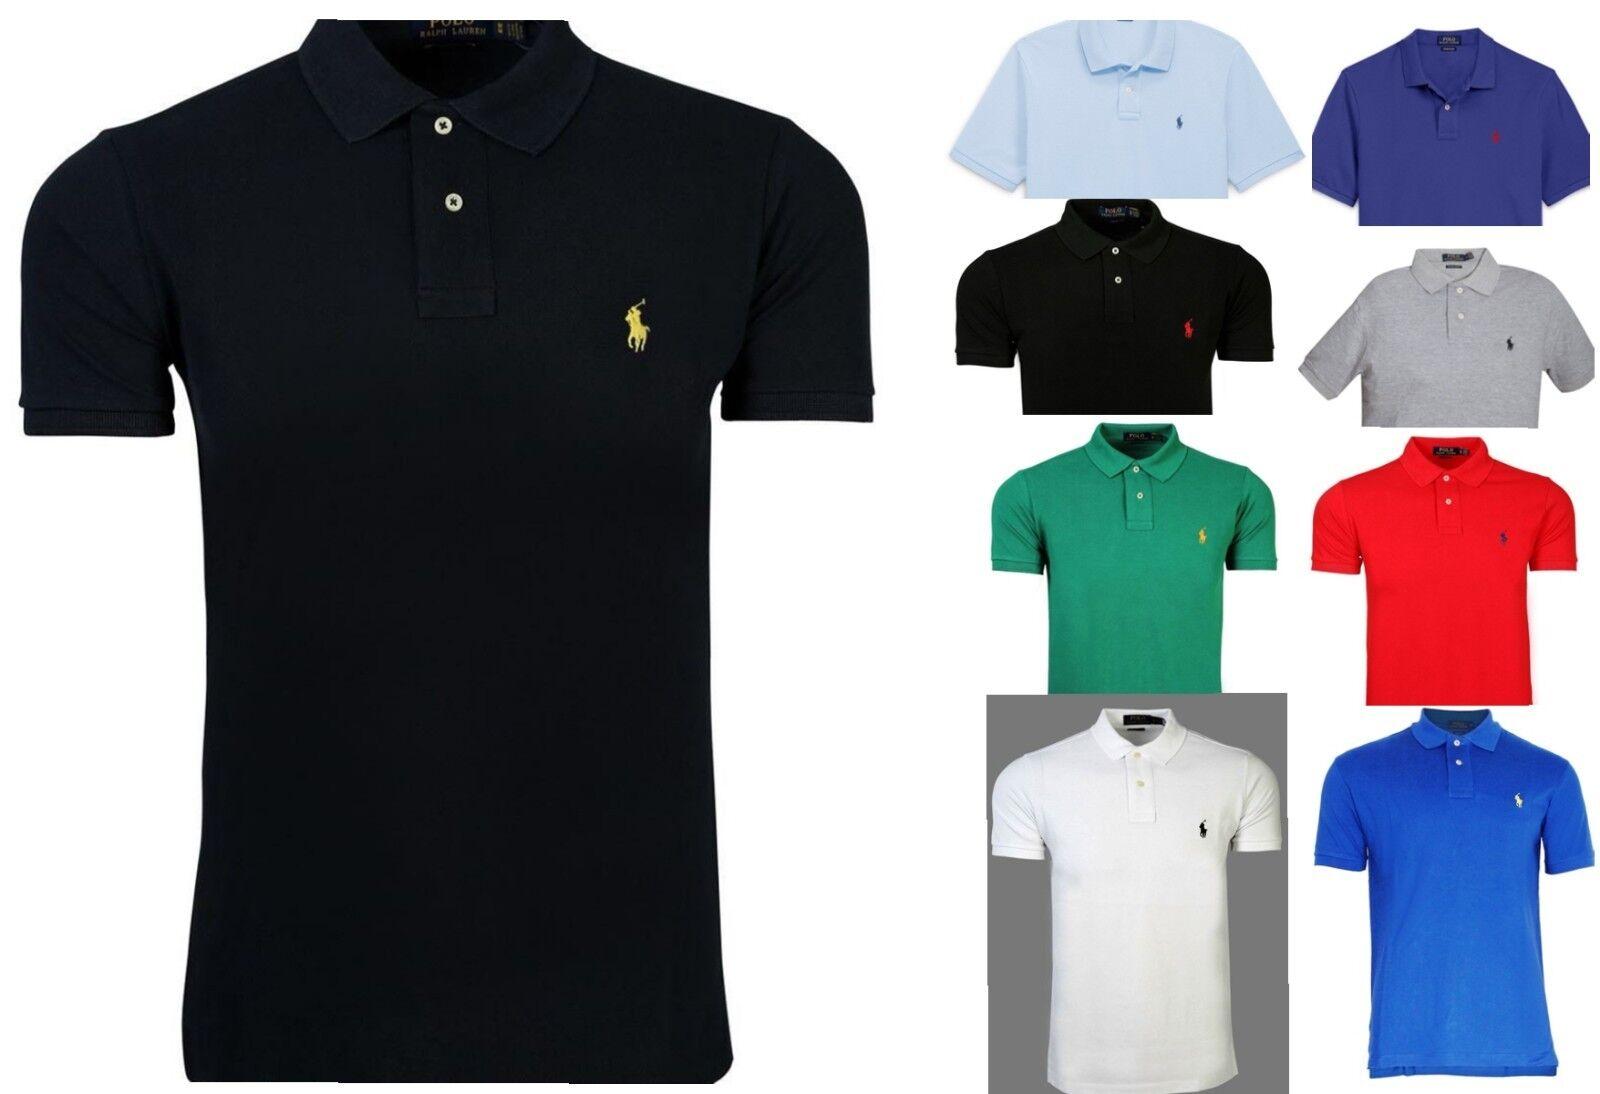 20bd126079bff6 Ralph Lauren Tshirt Weiss Test Vergleich +++ Ralph Lauren Tshirt ...